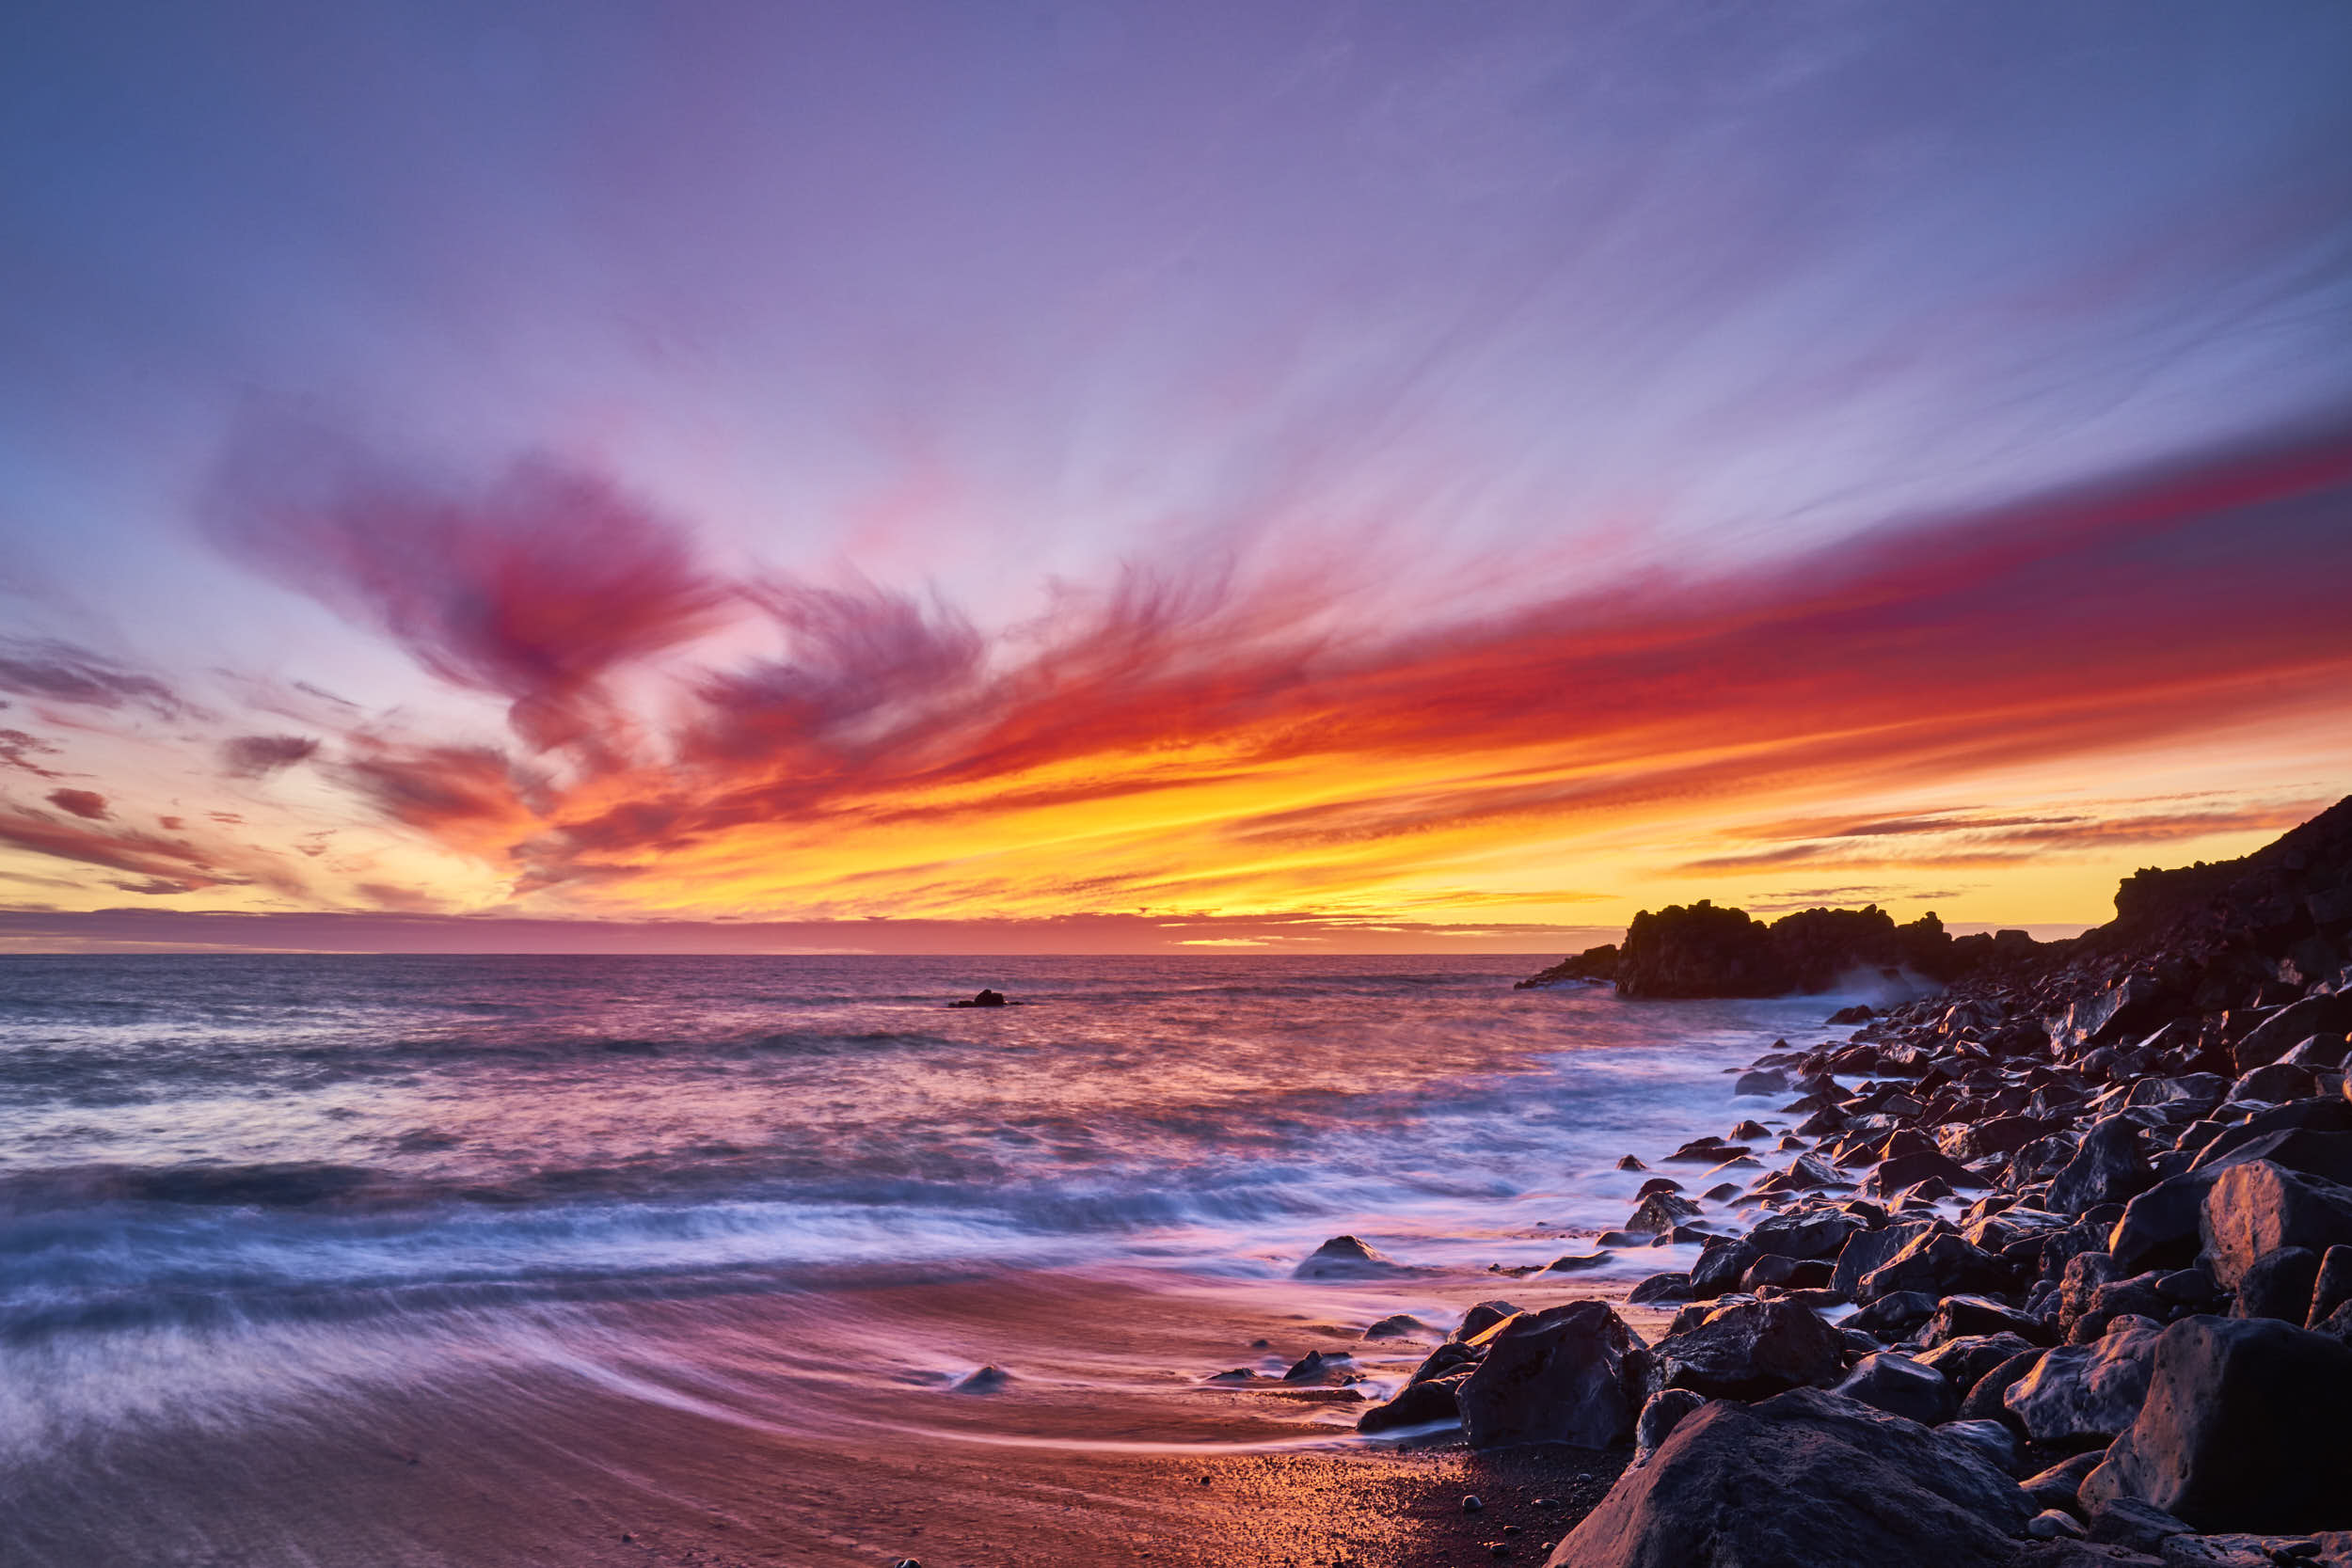 Sunset on Playa del Faro, La Palma